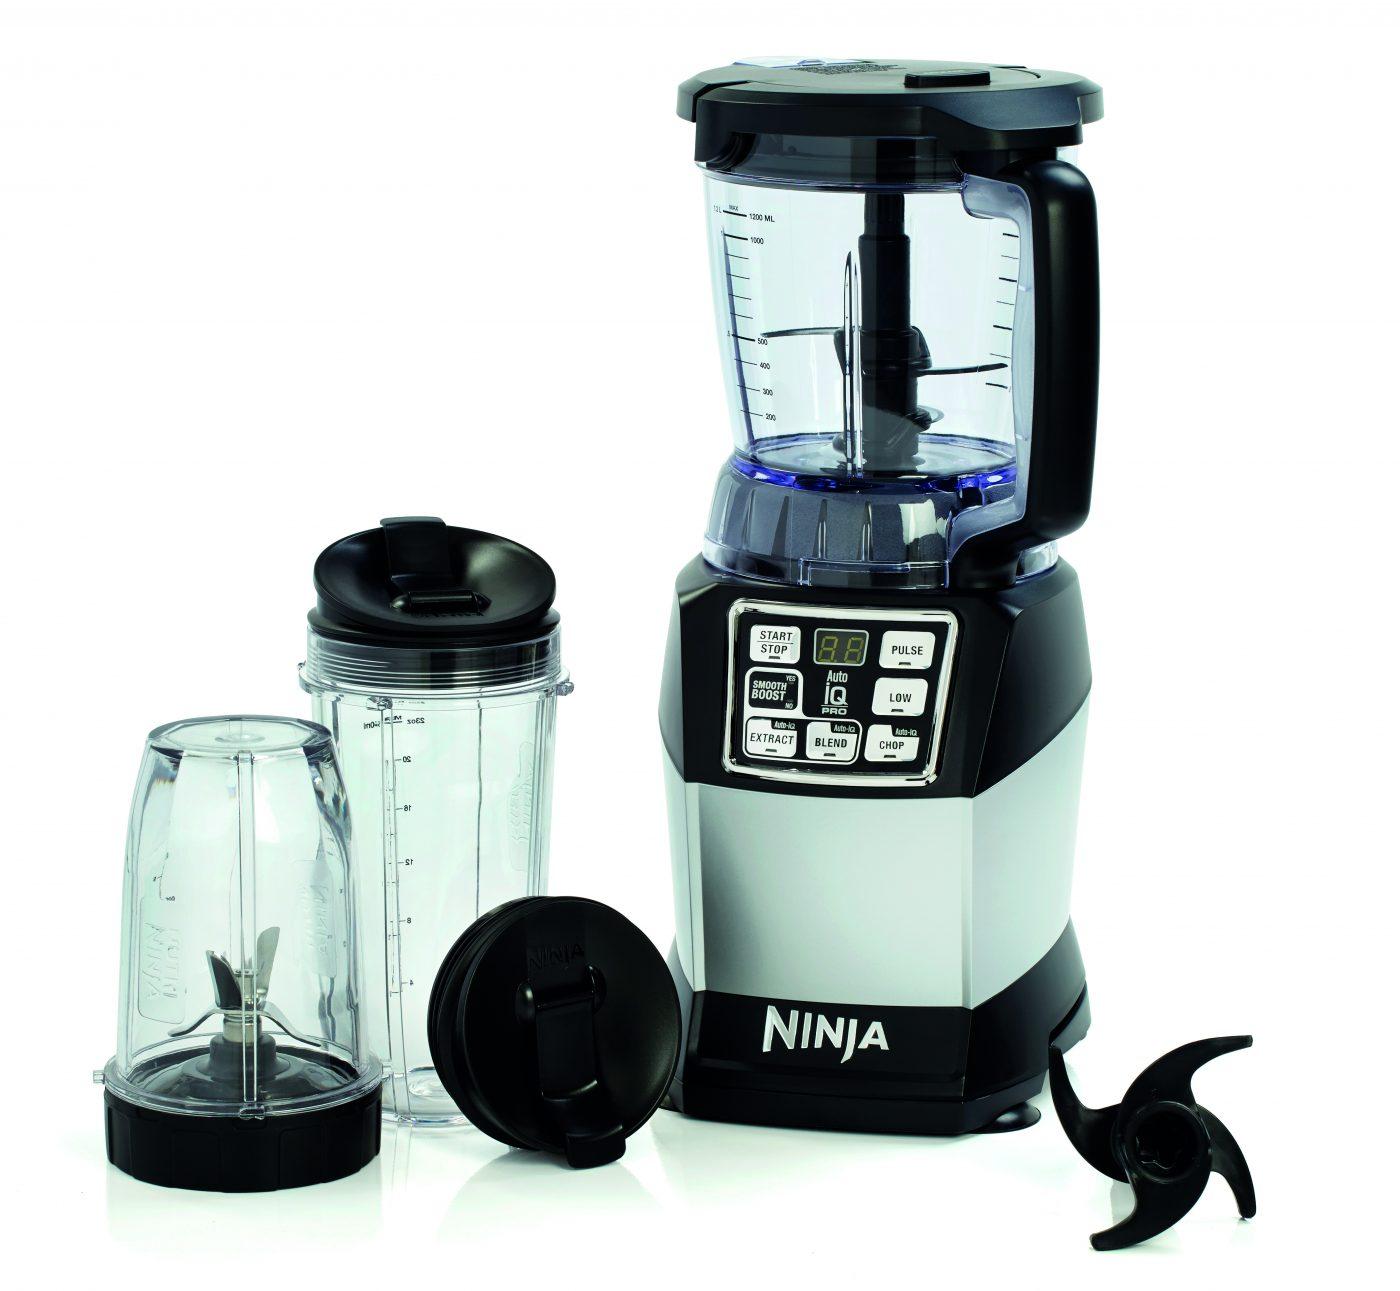 Ninja Compact Kitchen System with Nutri Ninja 1200W – BL490UK